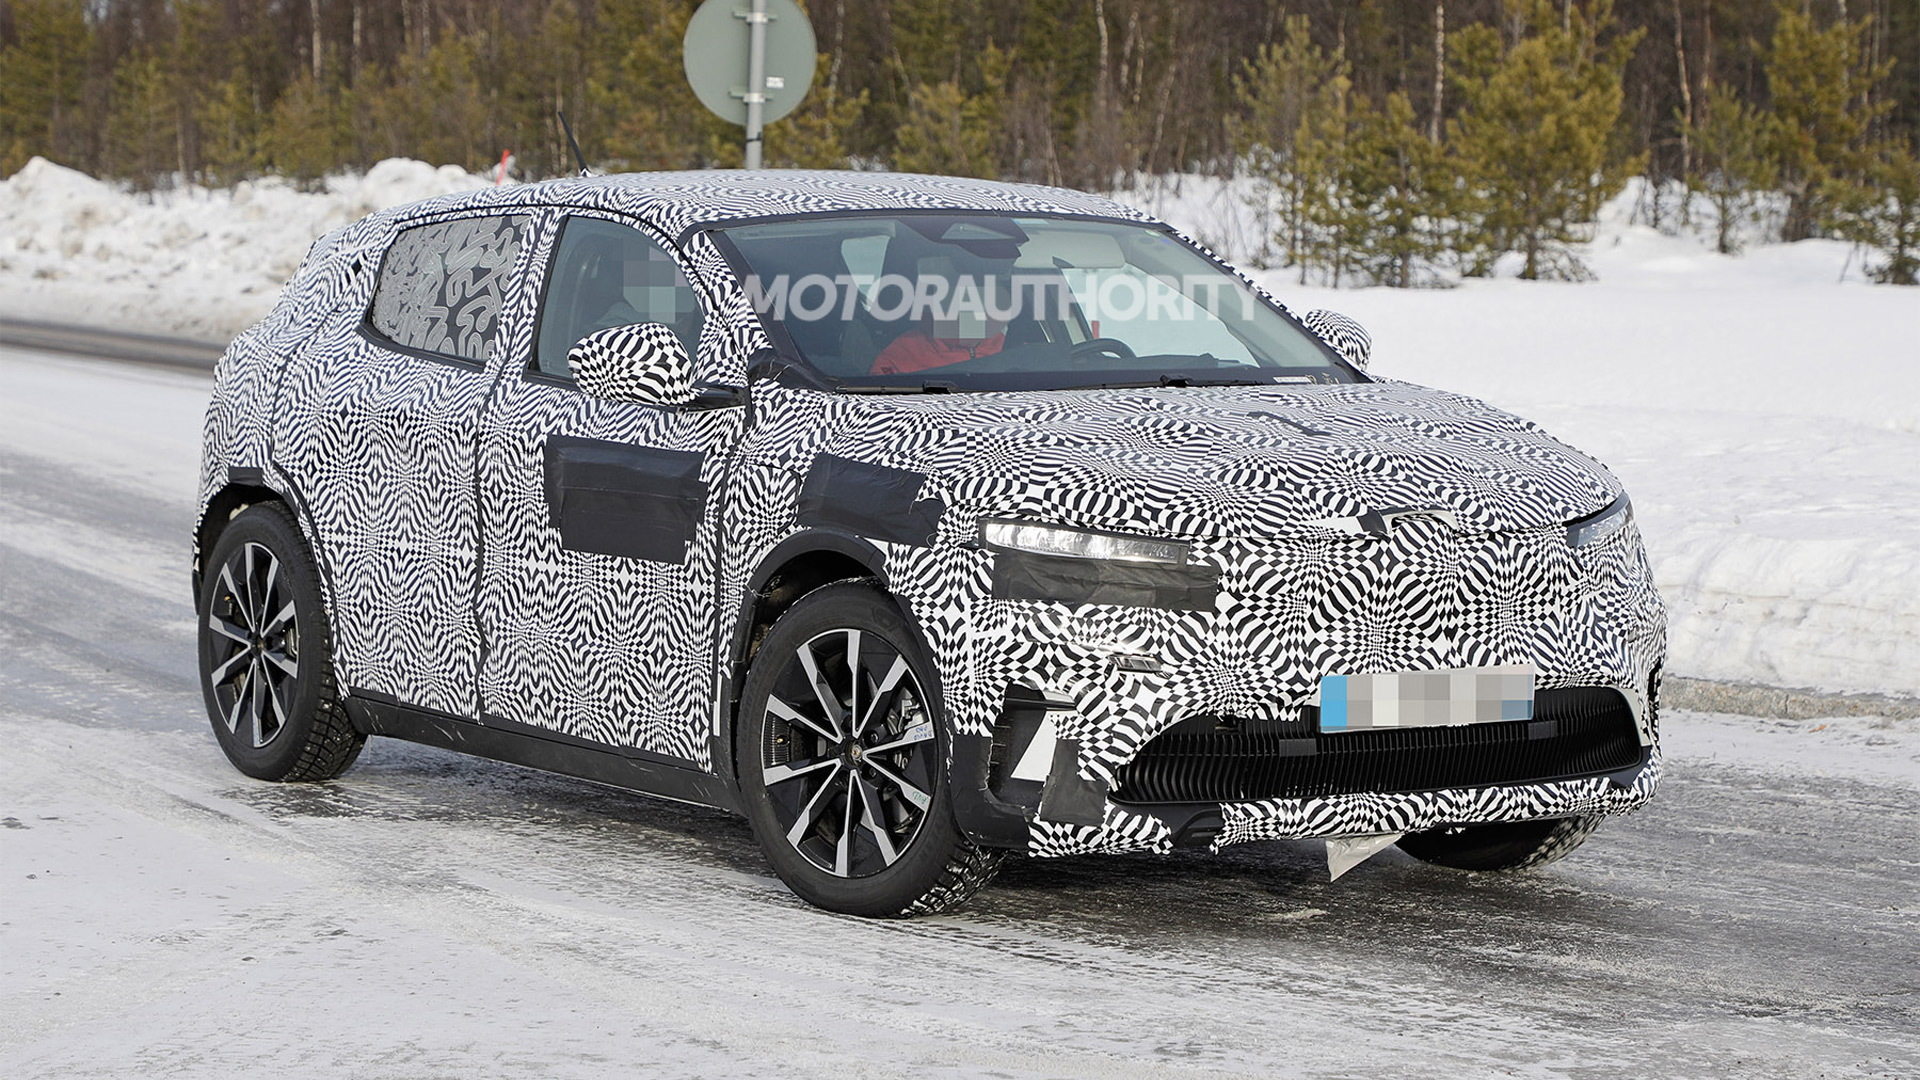 2022 Renault Megane electric crossover spy shots - Photo credit:S. Baldauf/SB-Medien